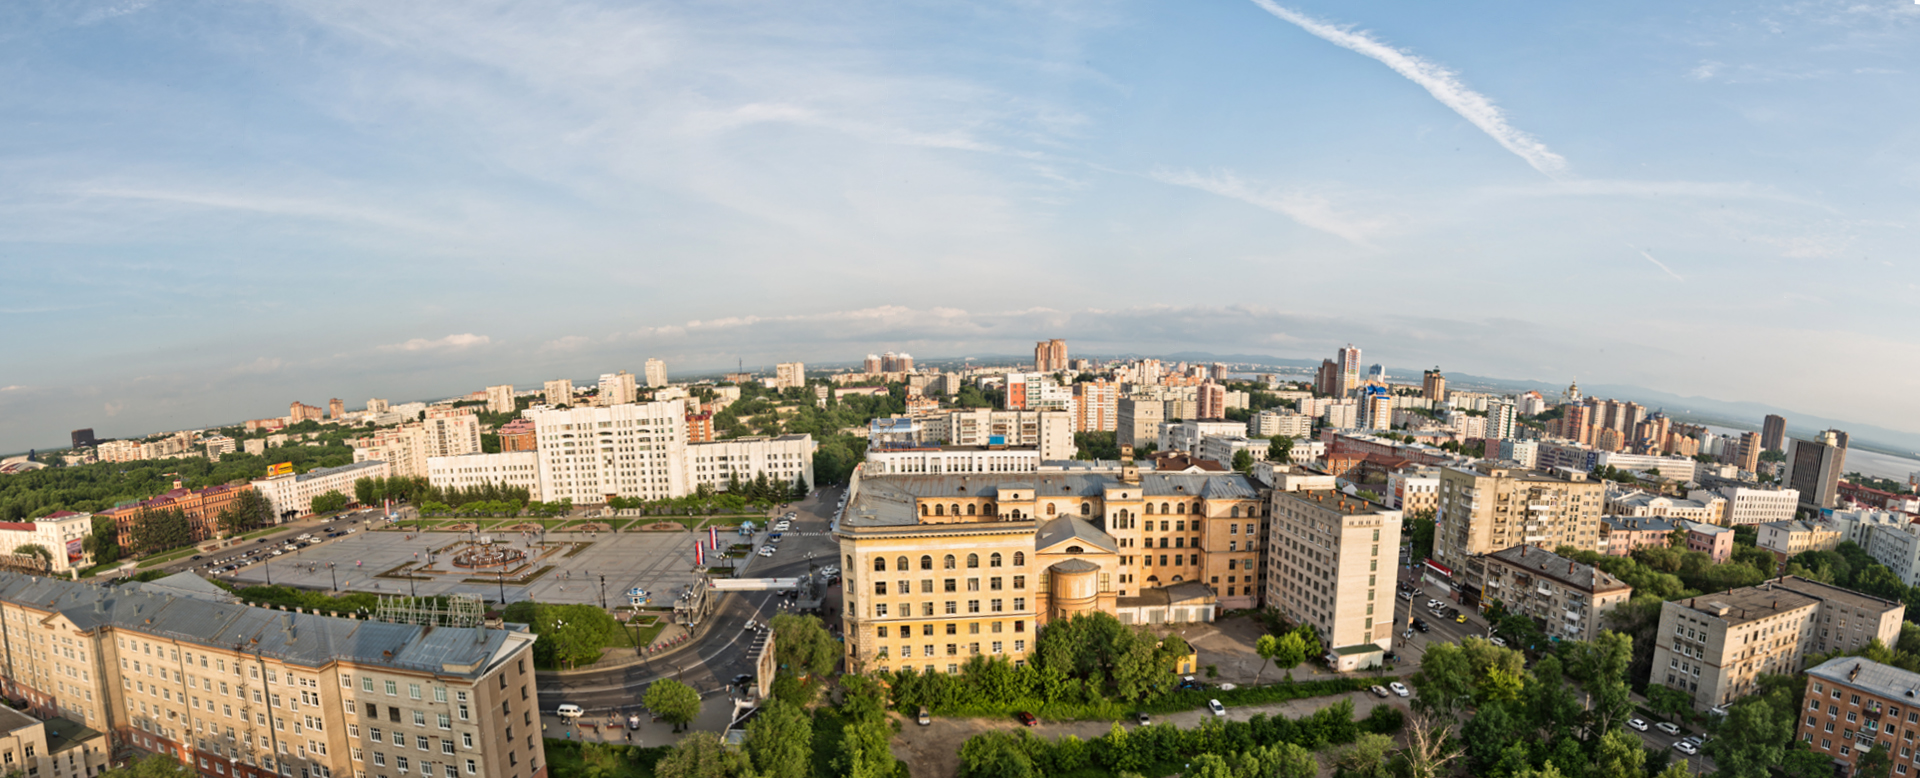 Panorama_Chabarowsk